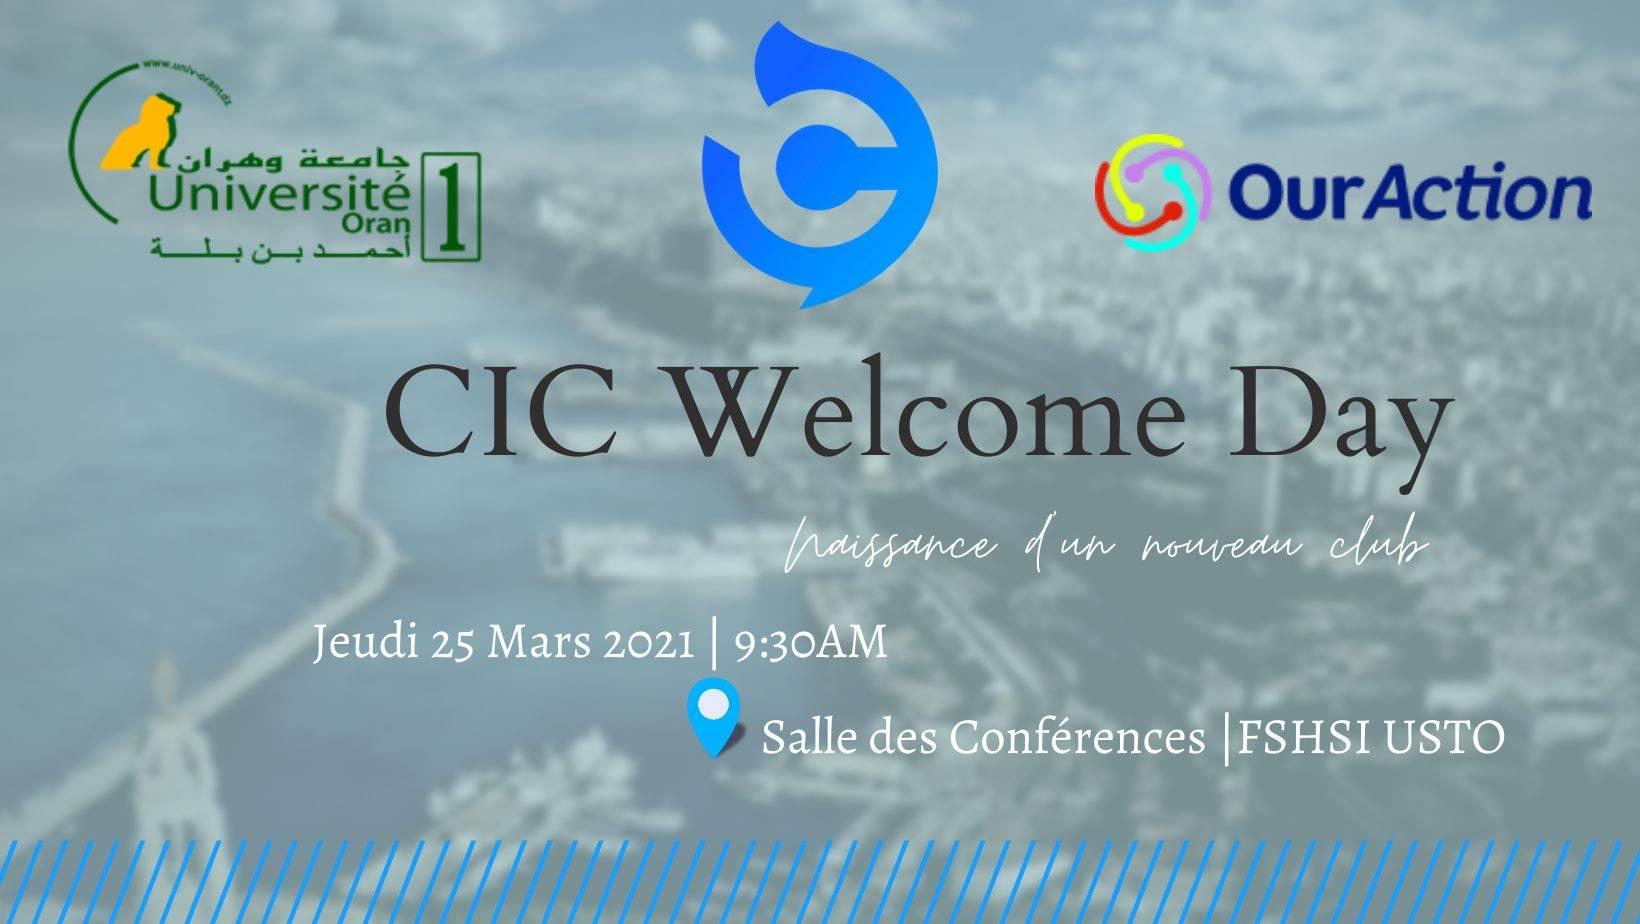 CIC Welcome Day - Club d'Information et Communication | نادي الإعلام و الإتصال